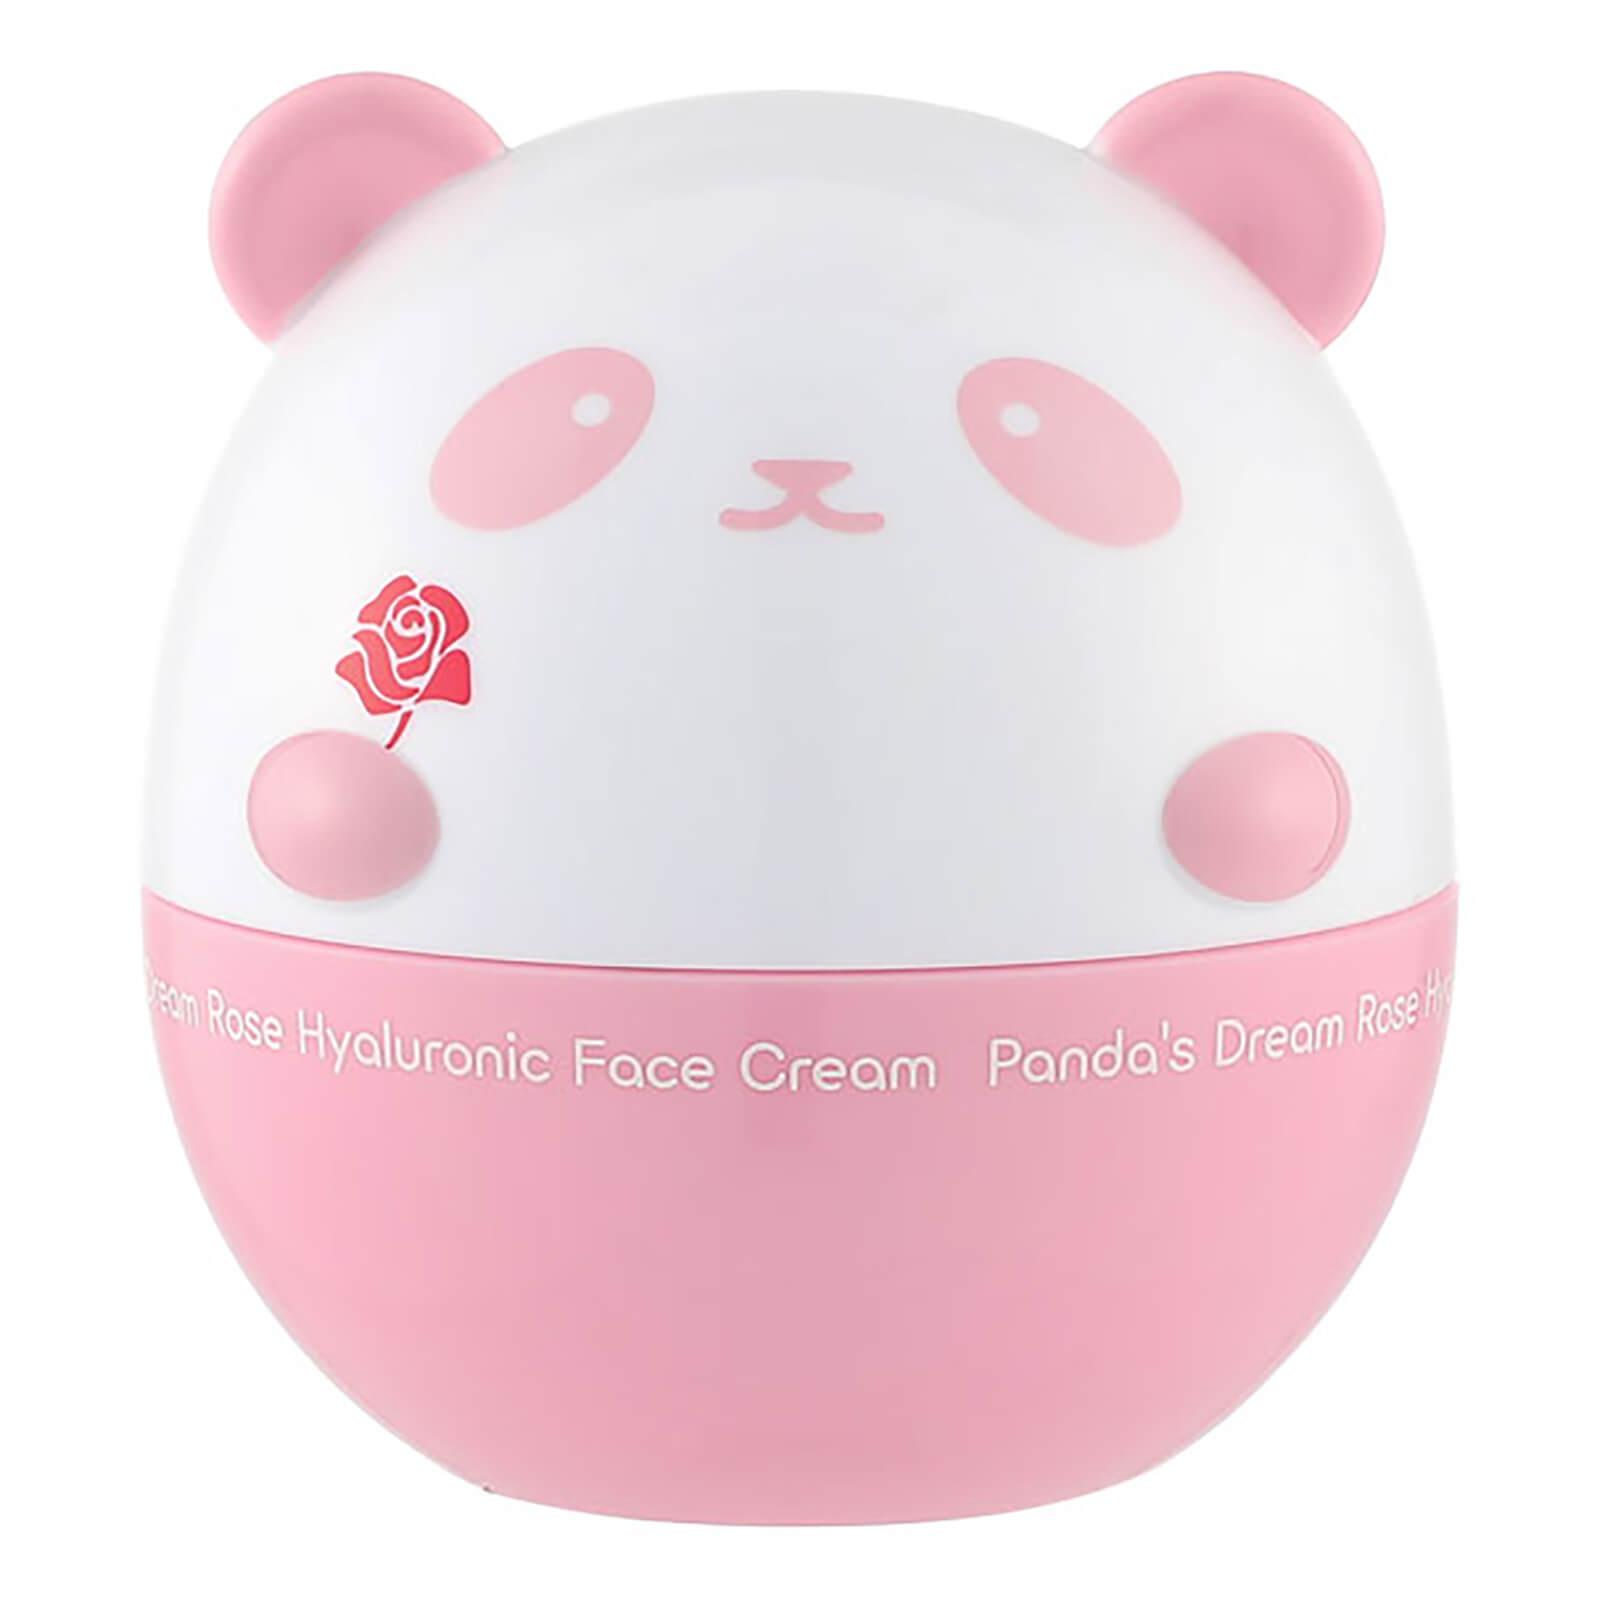 TONYMOLY - TONYMOLY Panda's Dream Rose Hyaluronic Face Cream